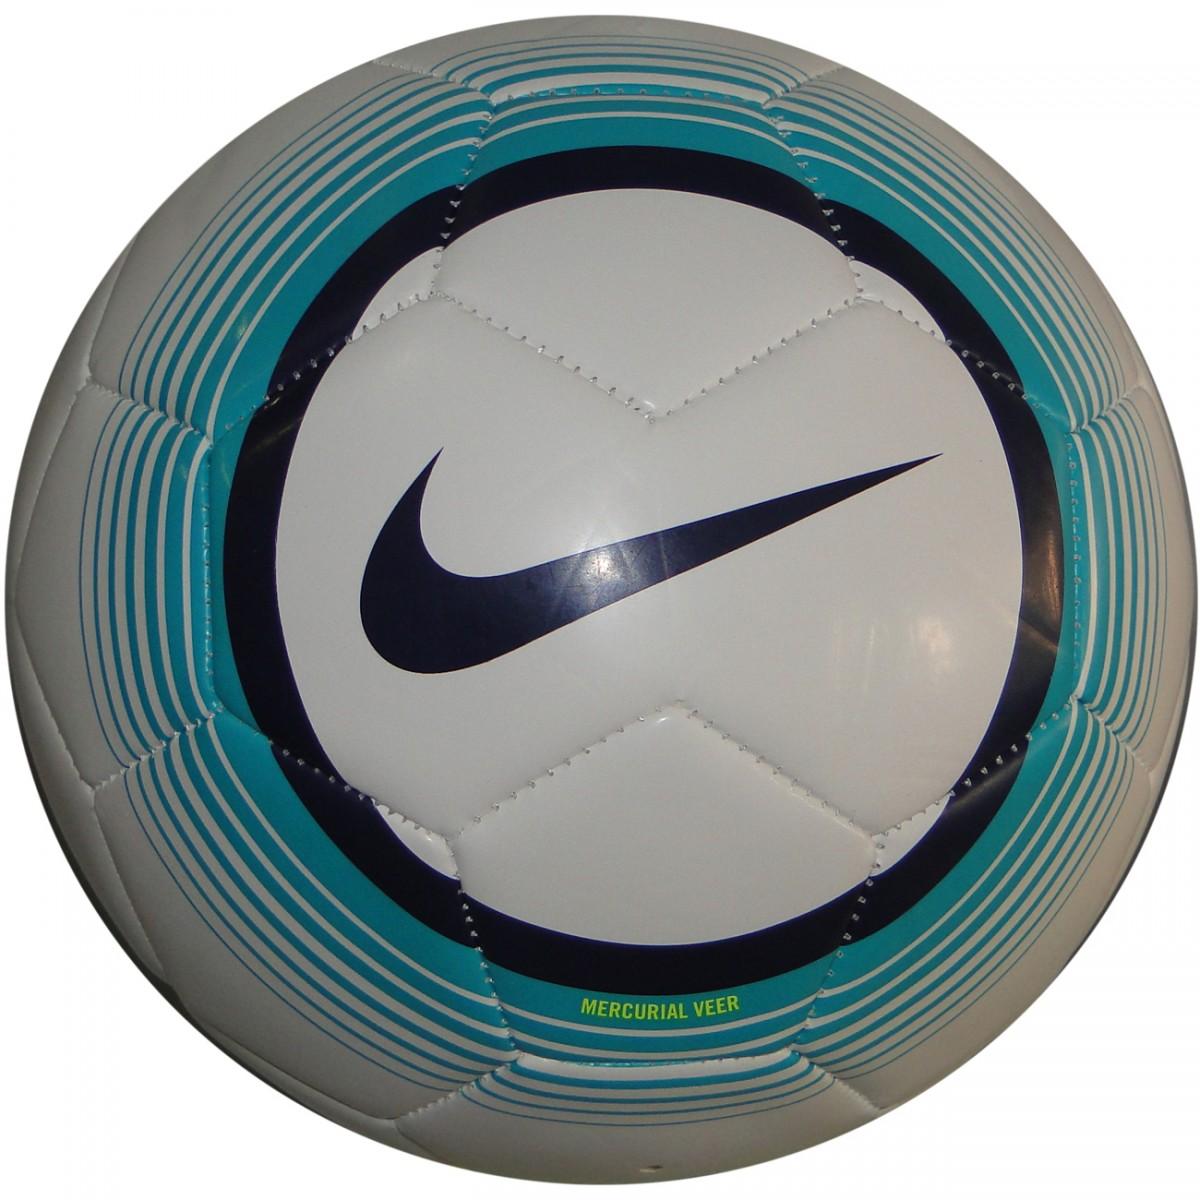 Bola Nike Mercurial Veer Sc1903 8560 - BRANCO MARINHO VERDE - Chuteira Nike f1c9e1d9f4818